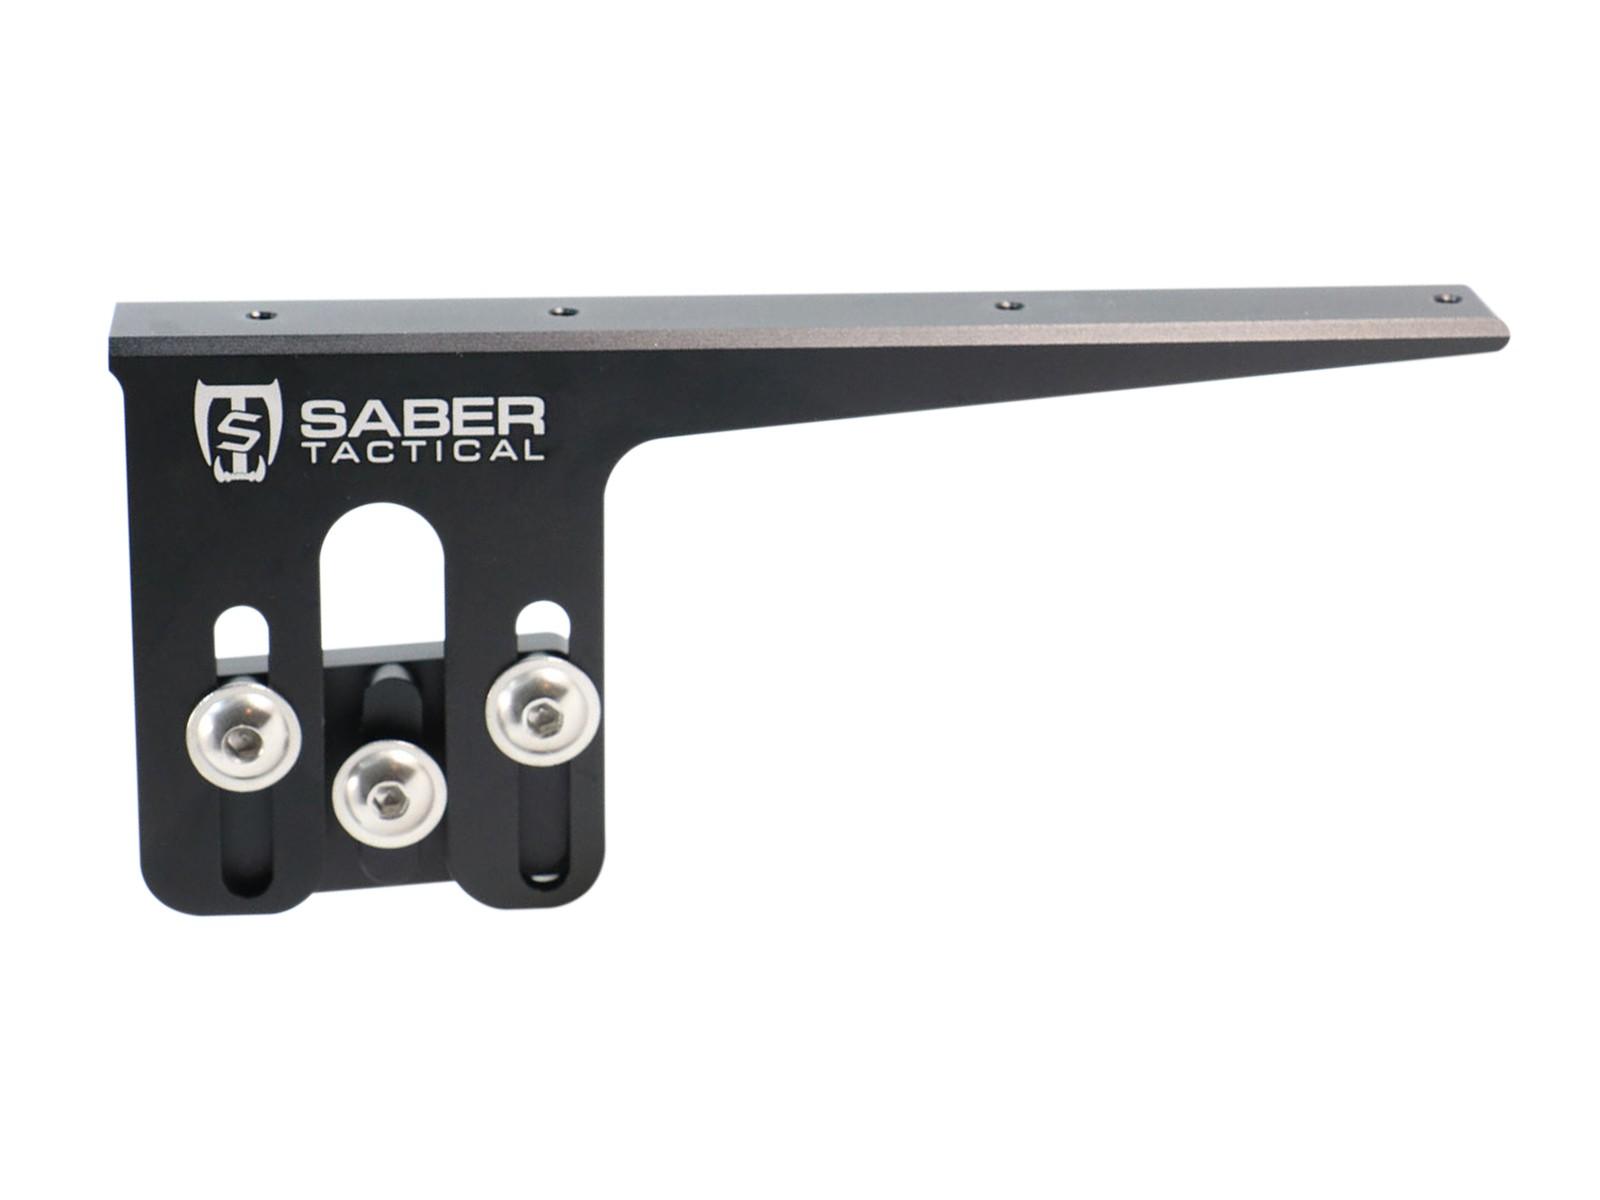 Saber Tactical FX Impact Cheek Riser